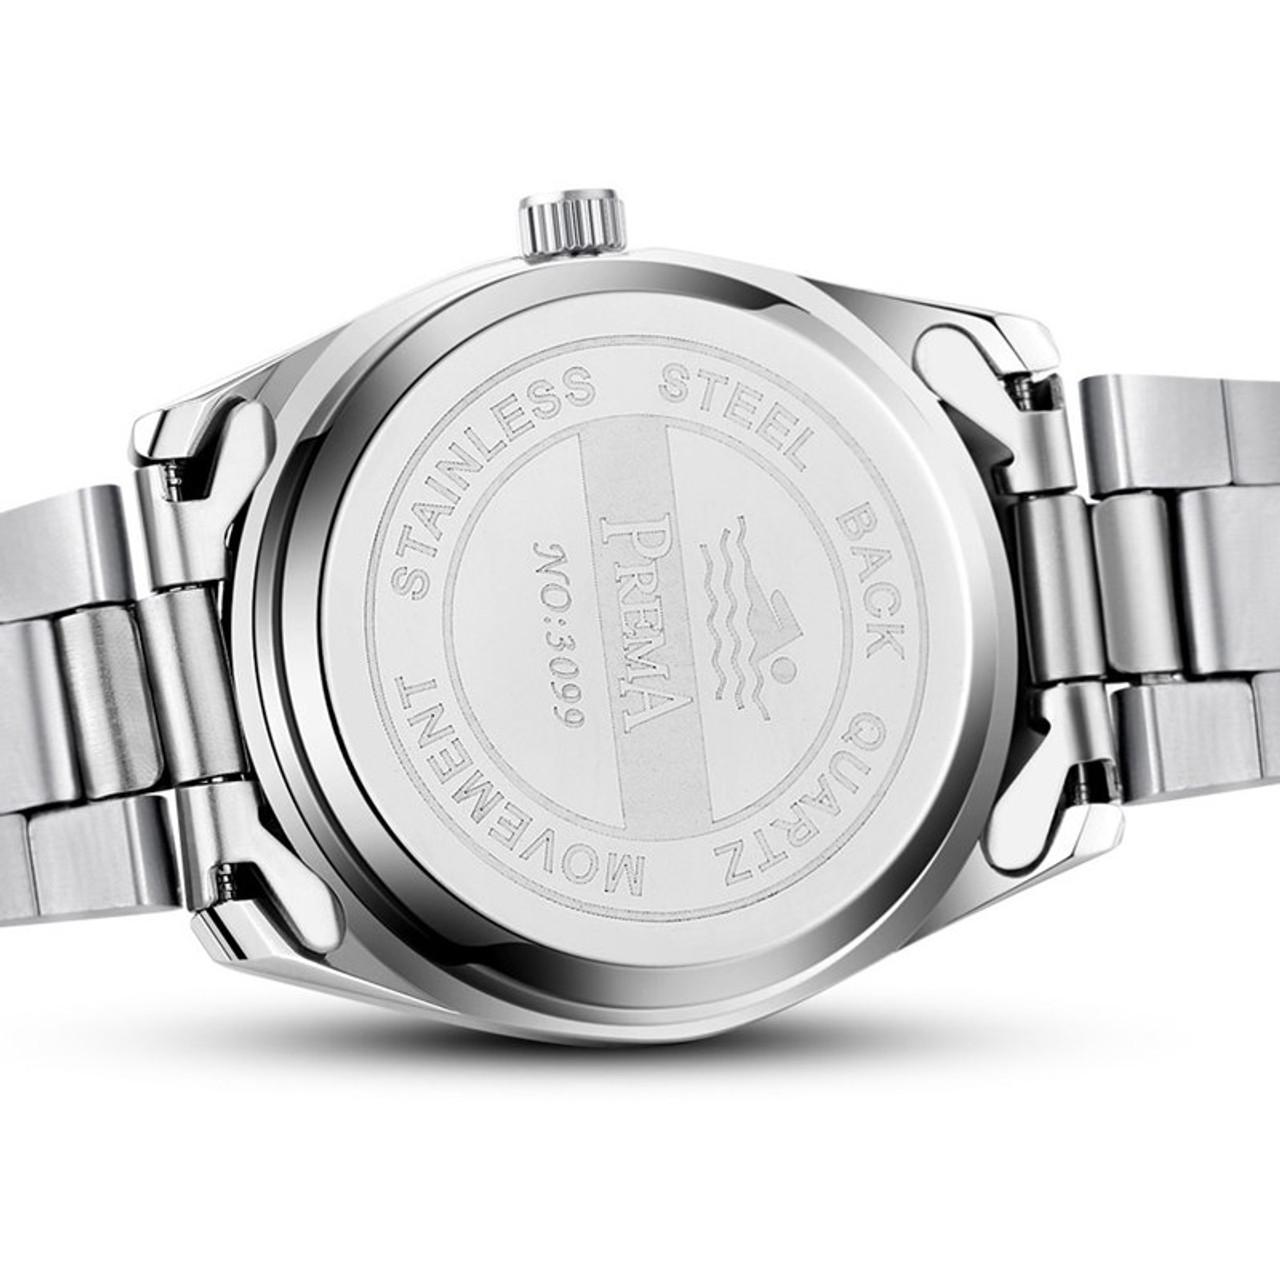 5867aa660347 ... PREMA Luxury Brand Fashion Watches Women Watch Ladies Rhinestone Quartz  Watch Women s Dress Clock Wristwatches relojes ...